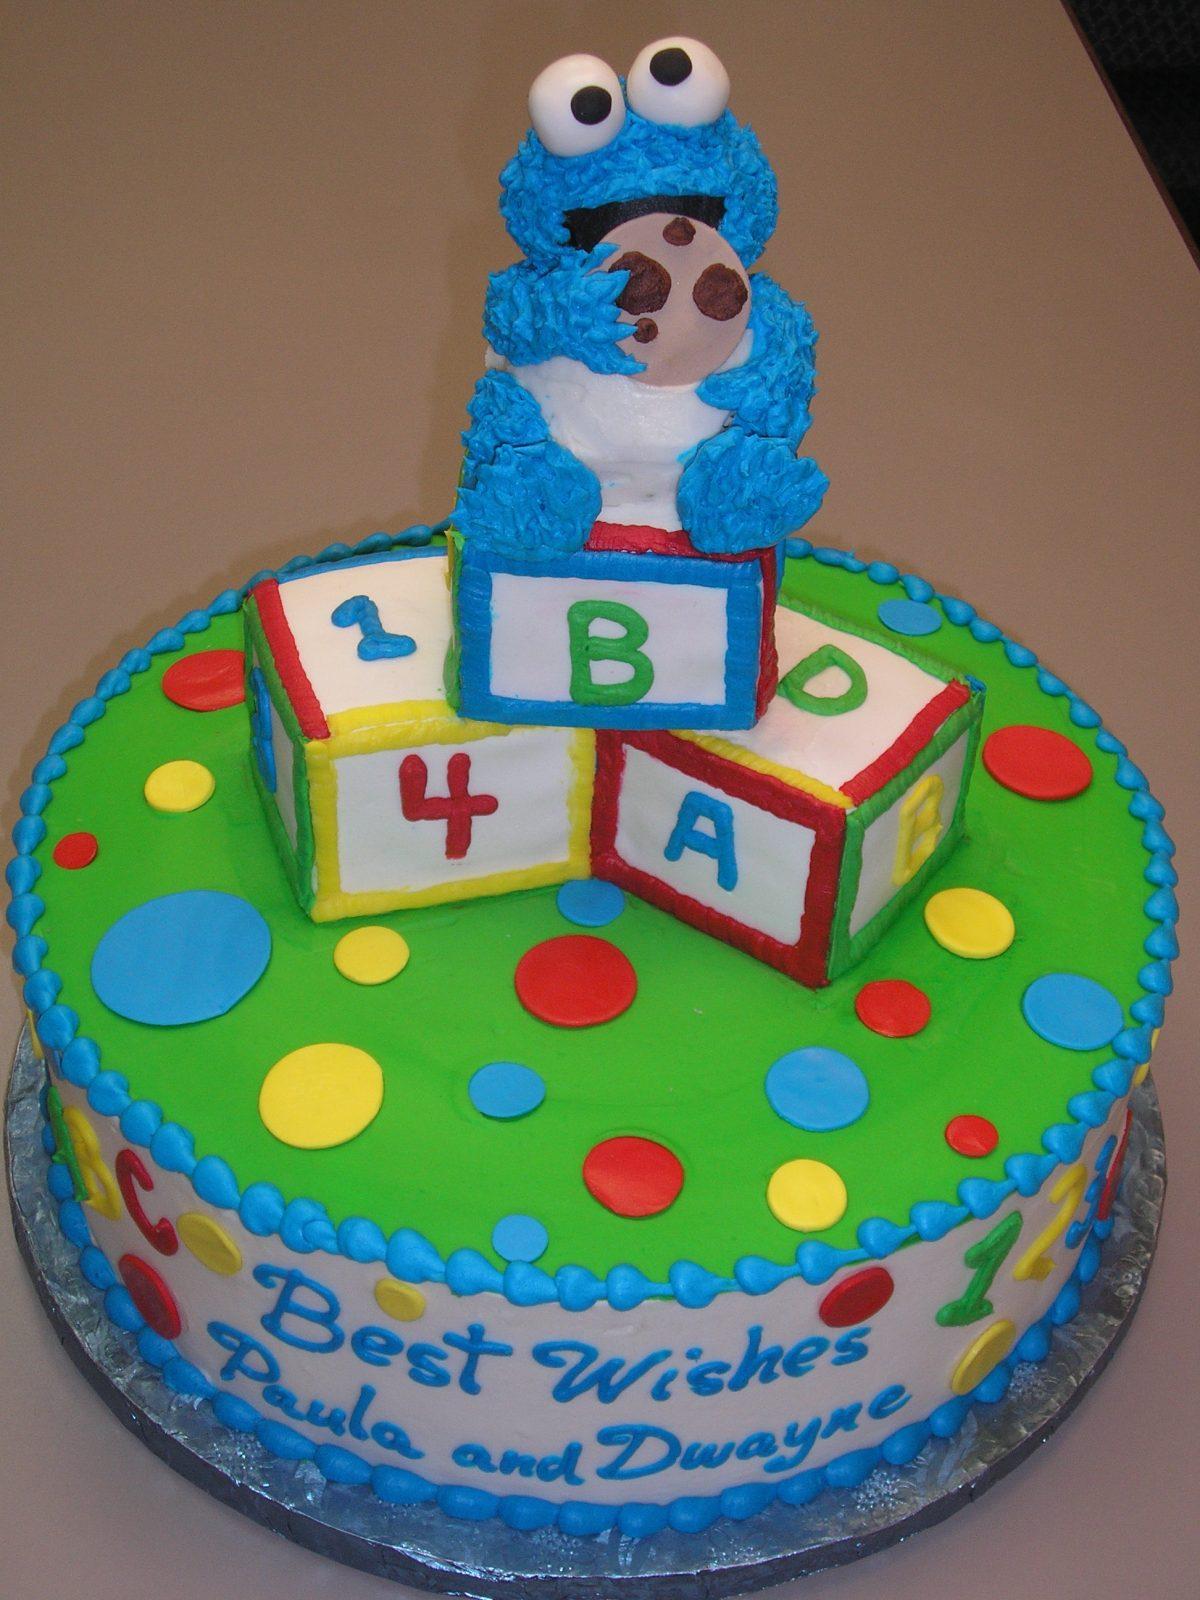 3D cookie monster cake, 3D building block cake